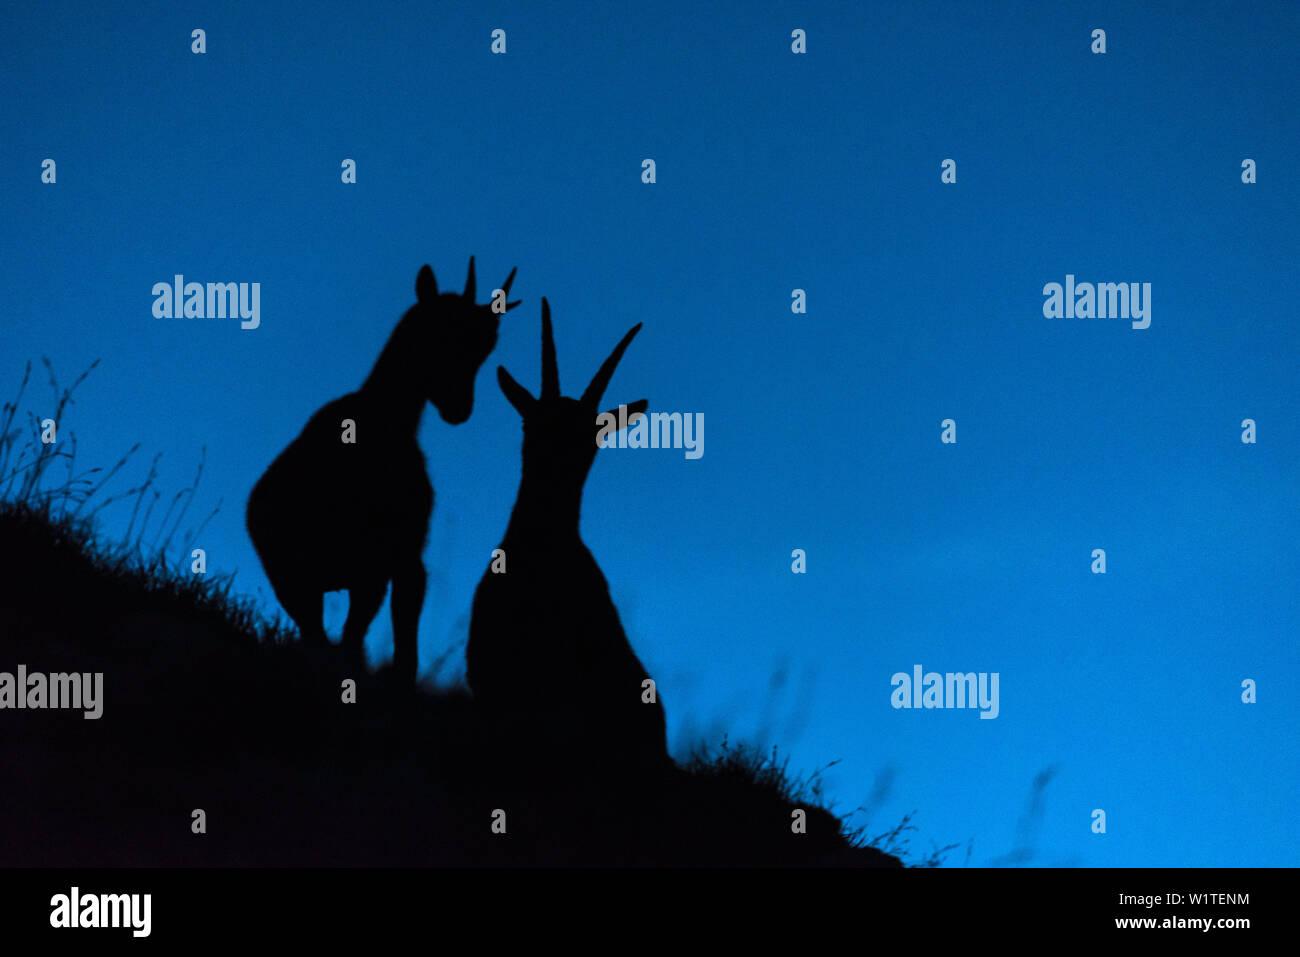 Capricorn Ibex Animal Germany Europe Stockfotos und  bilder Kaufen ...